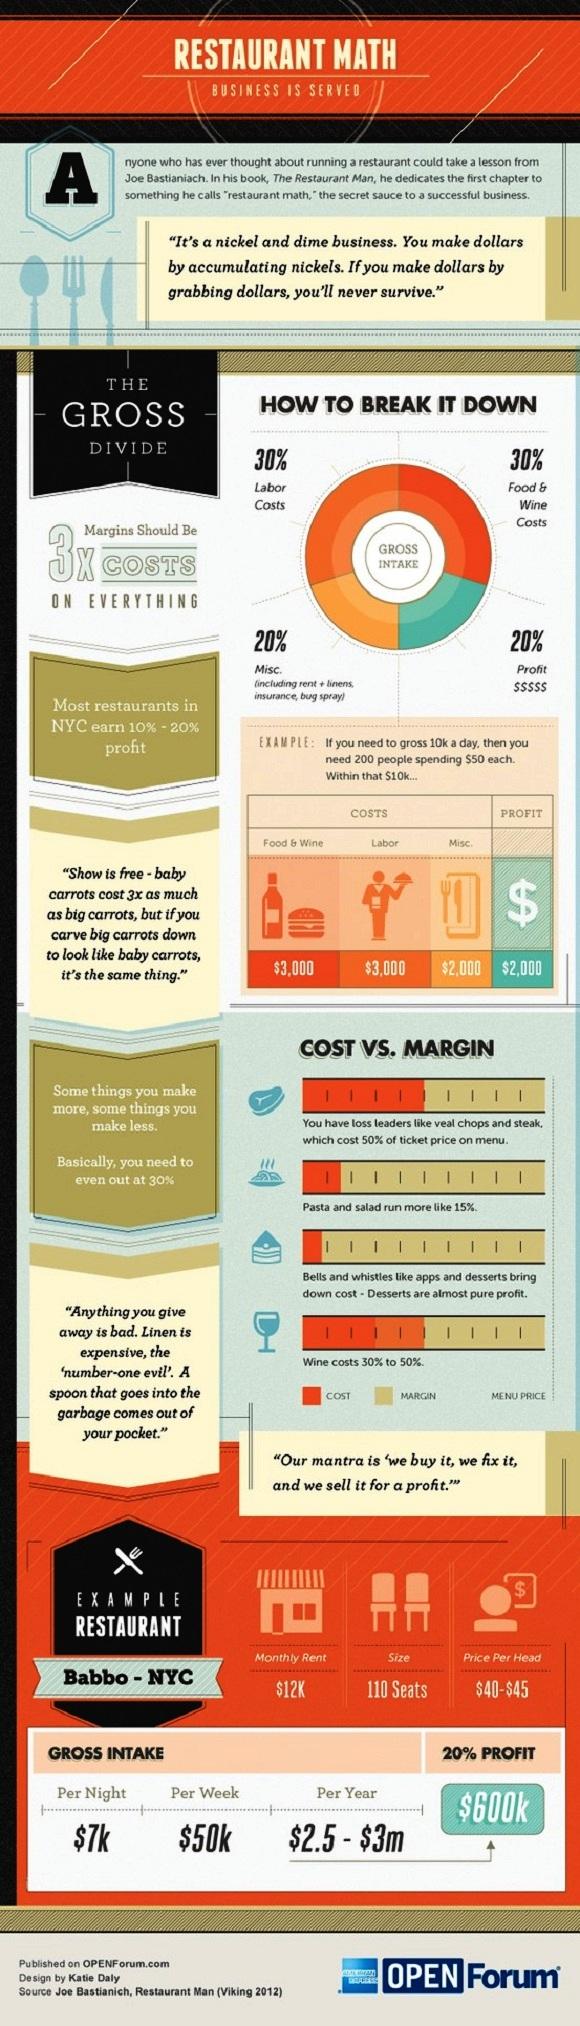 infographic restaurant managment tips